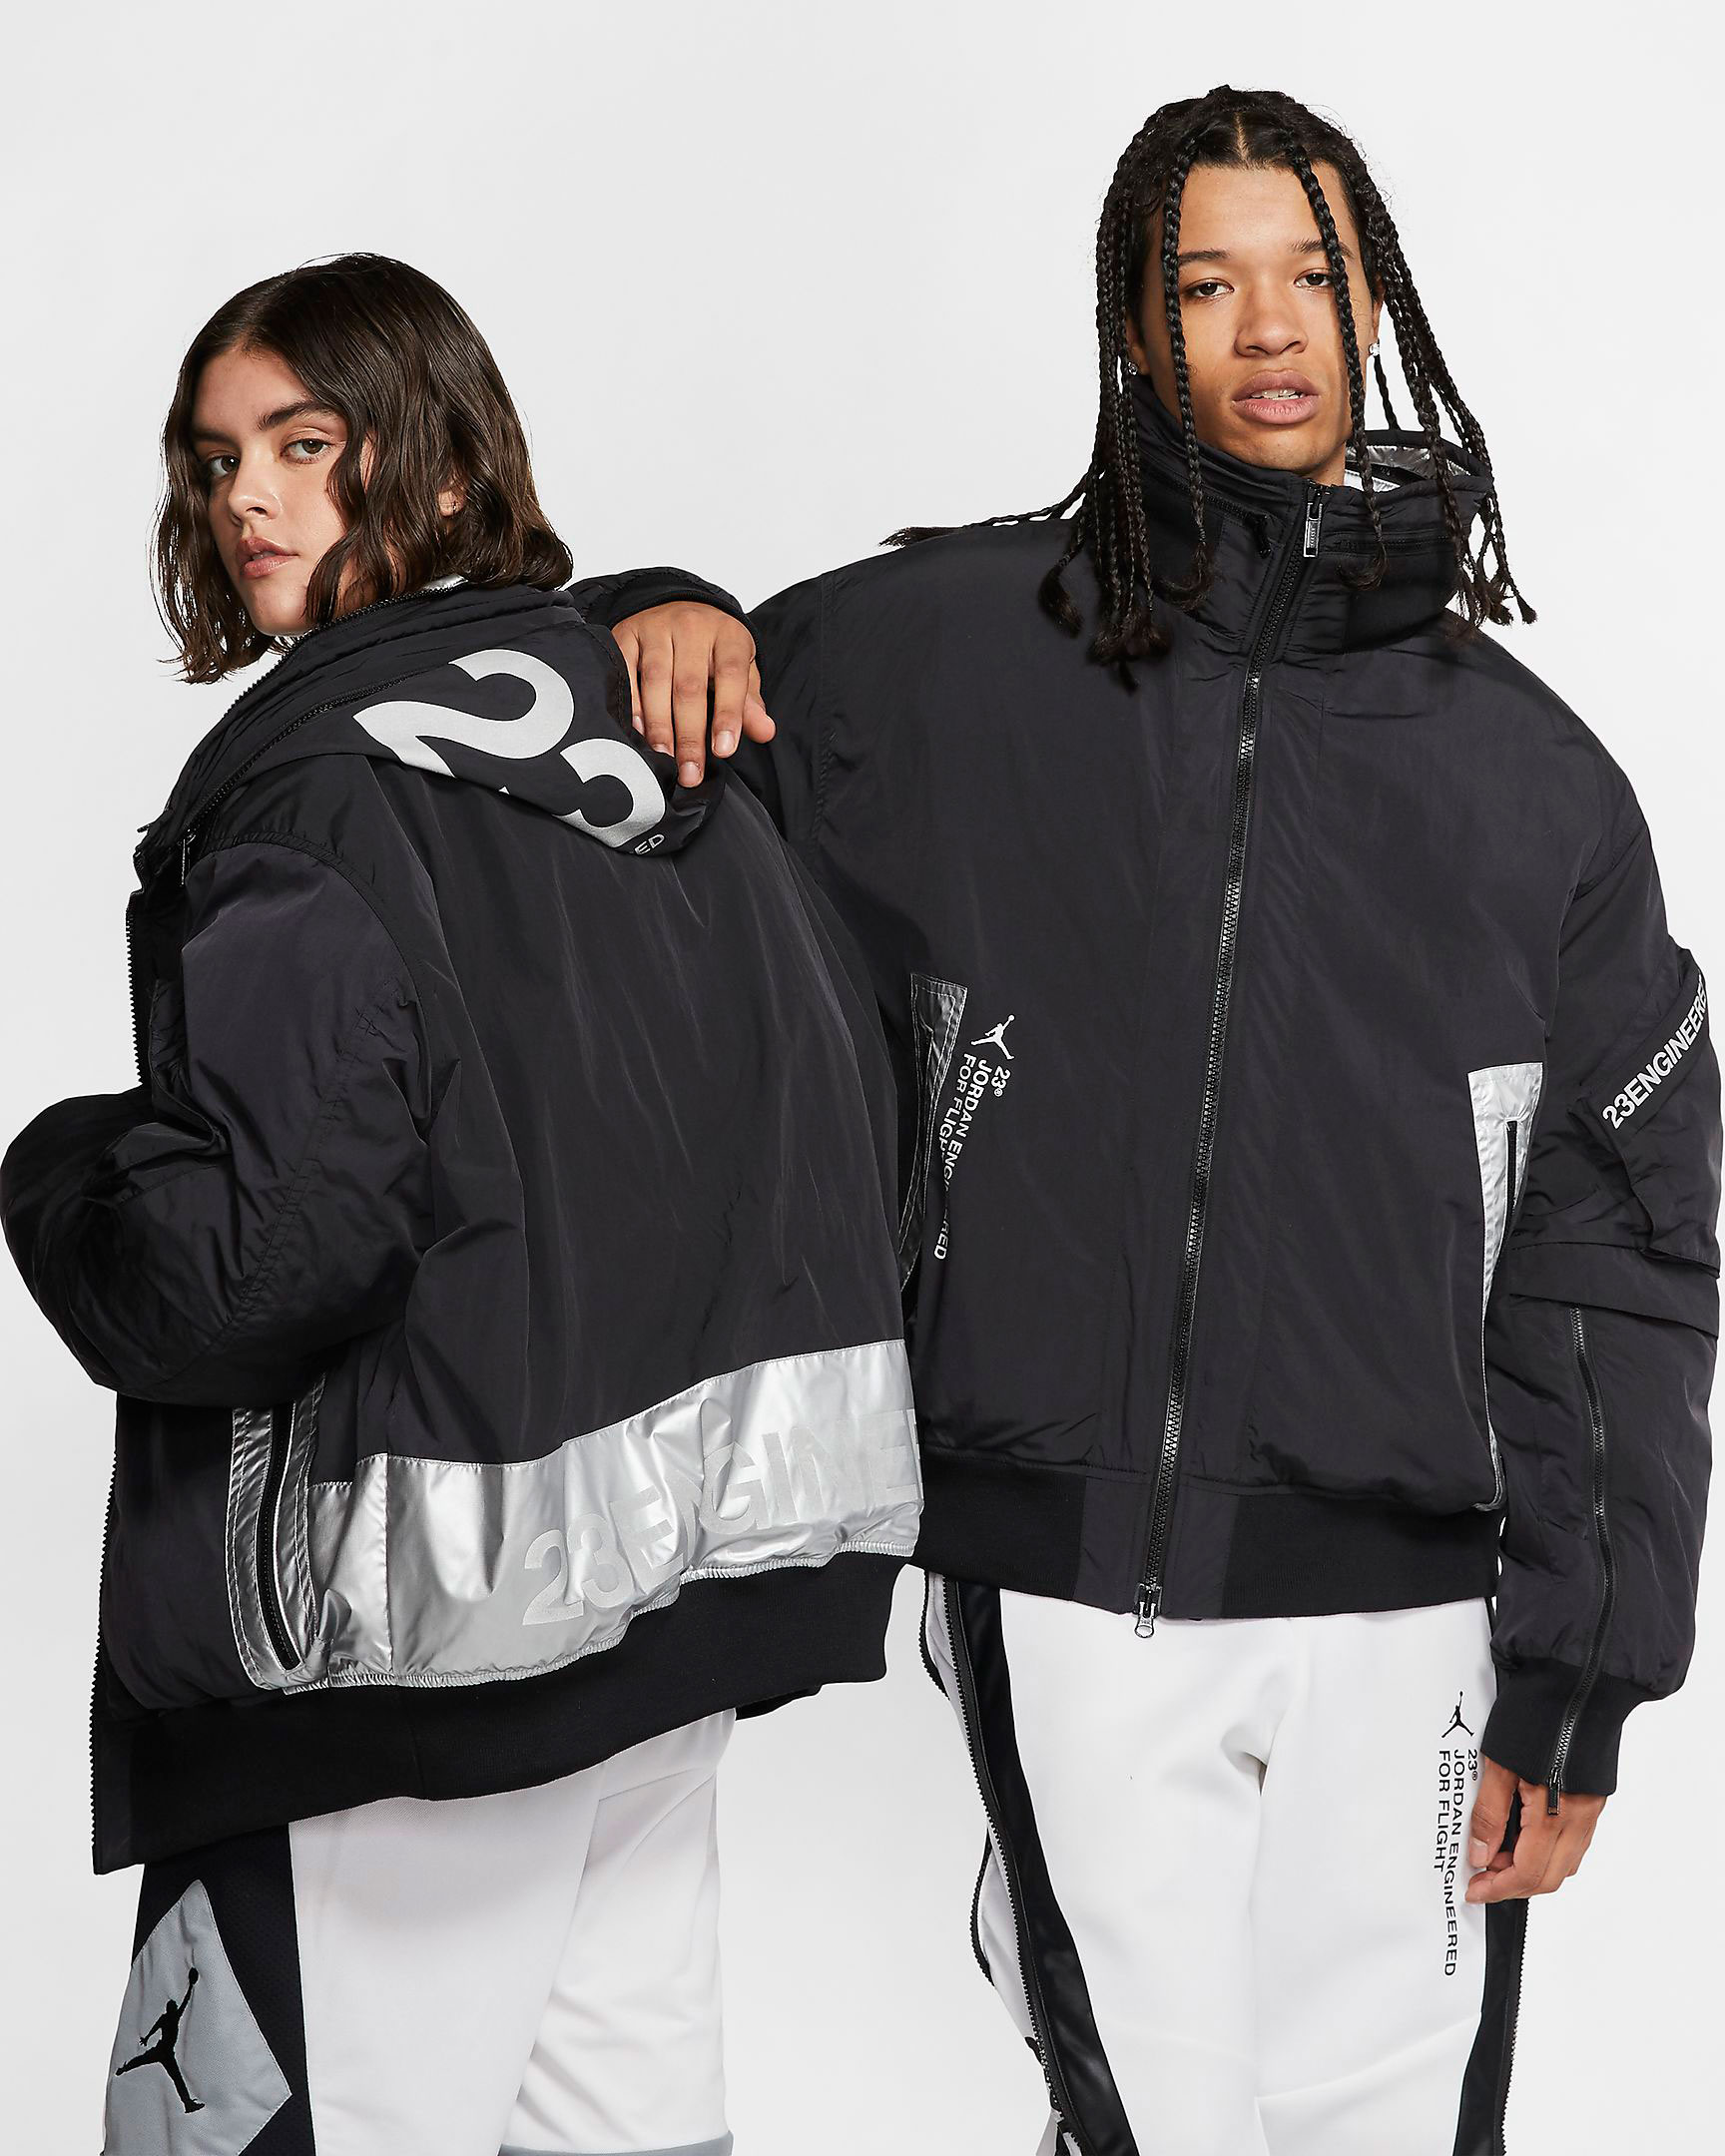 jordan-23-engineered-ma1-down-jacket-black-silver-1